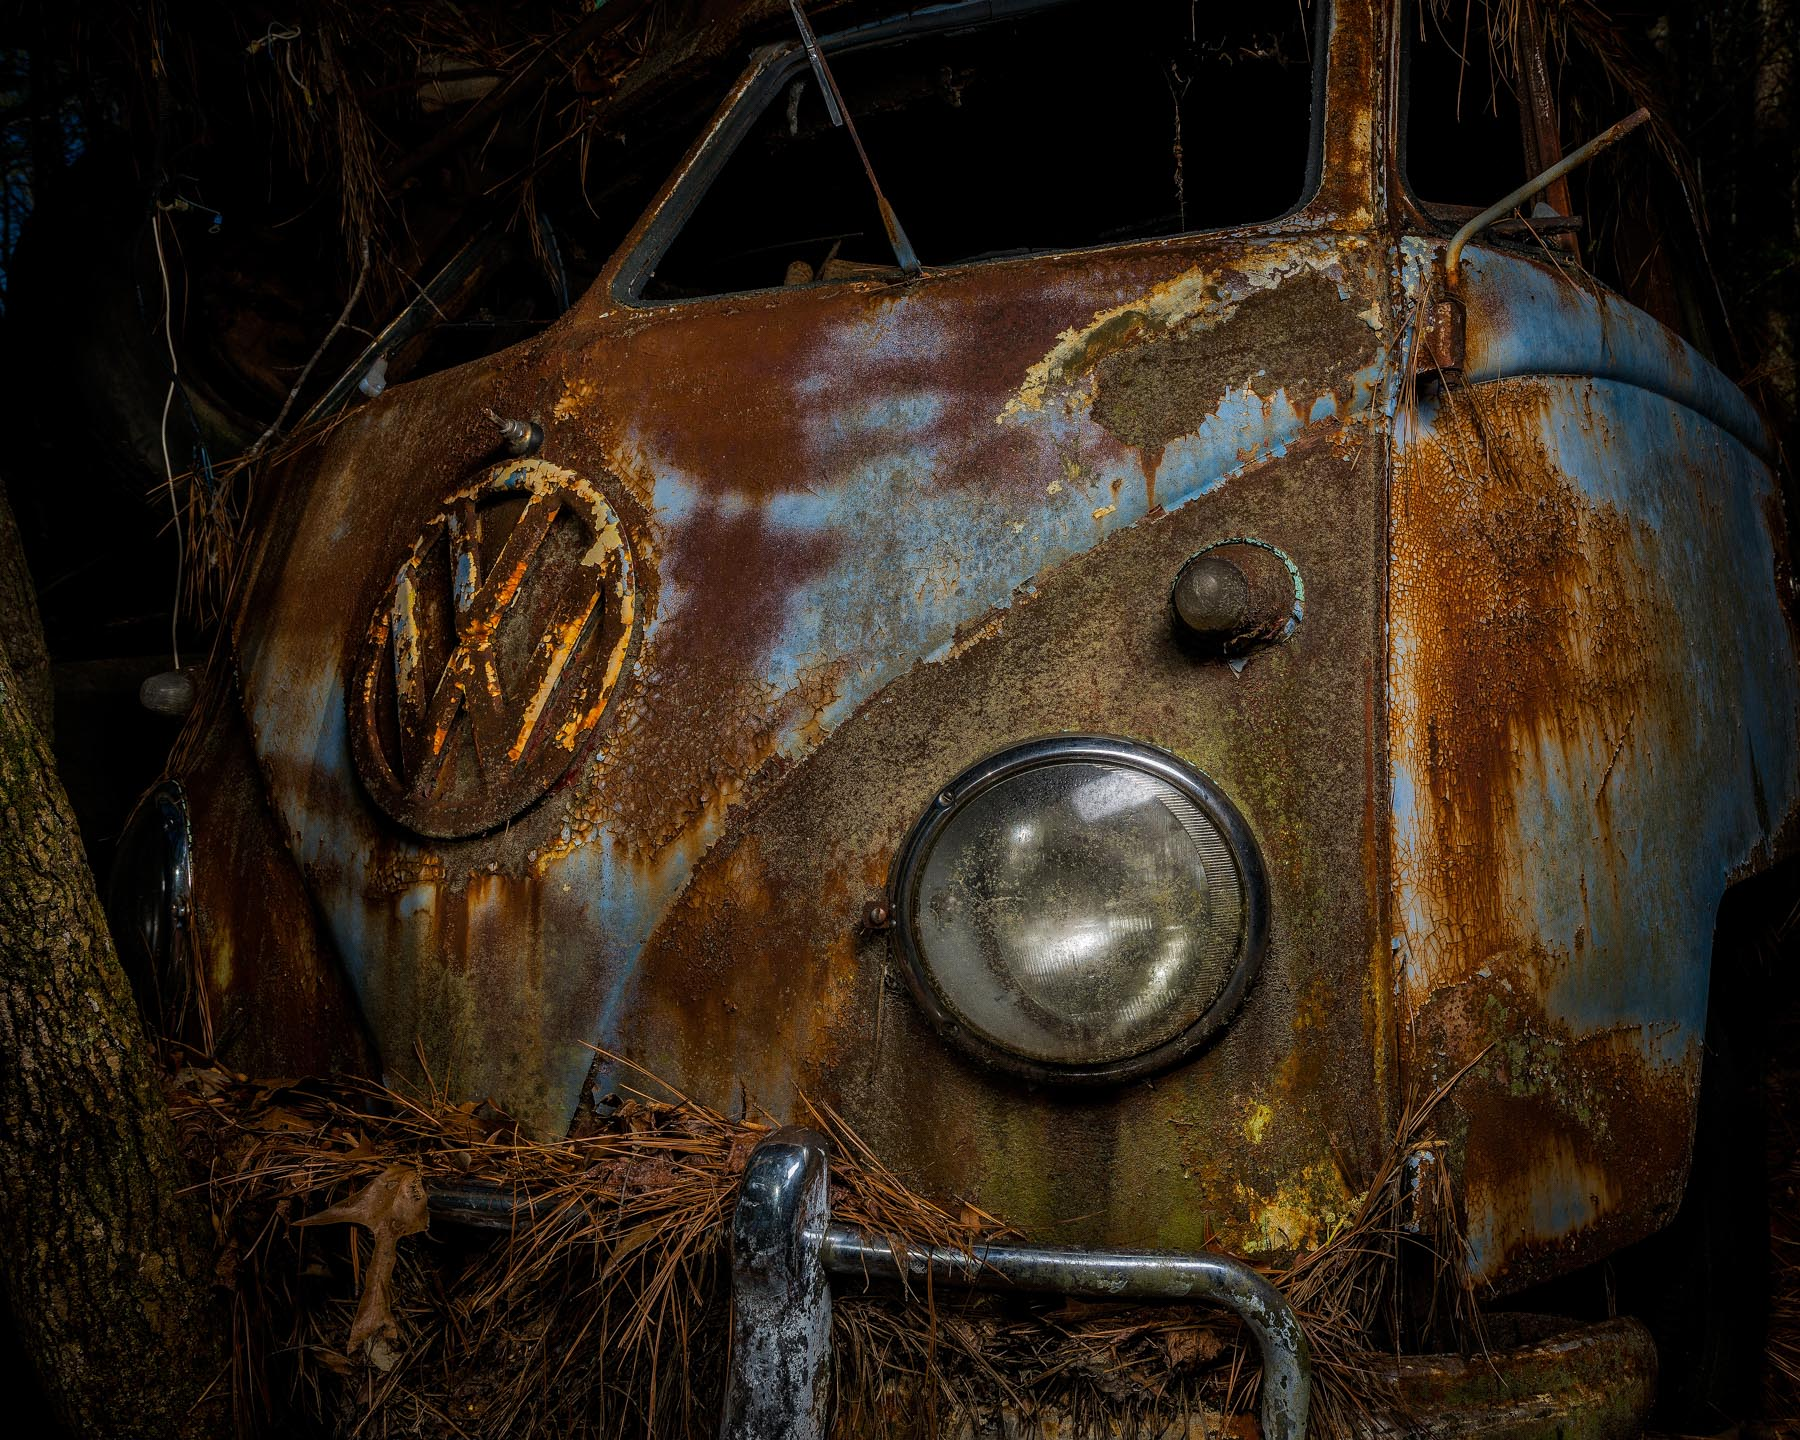 1960 VW Bus